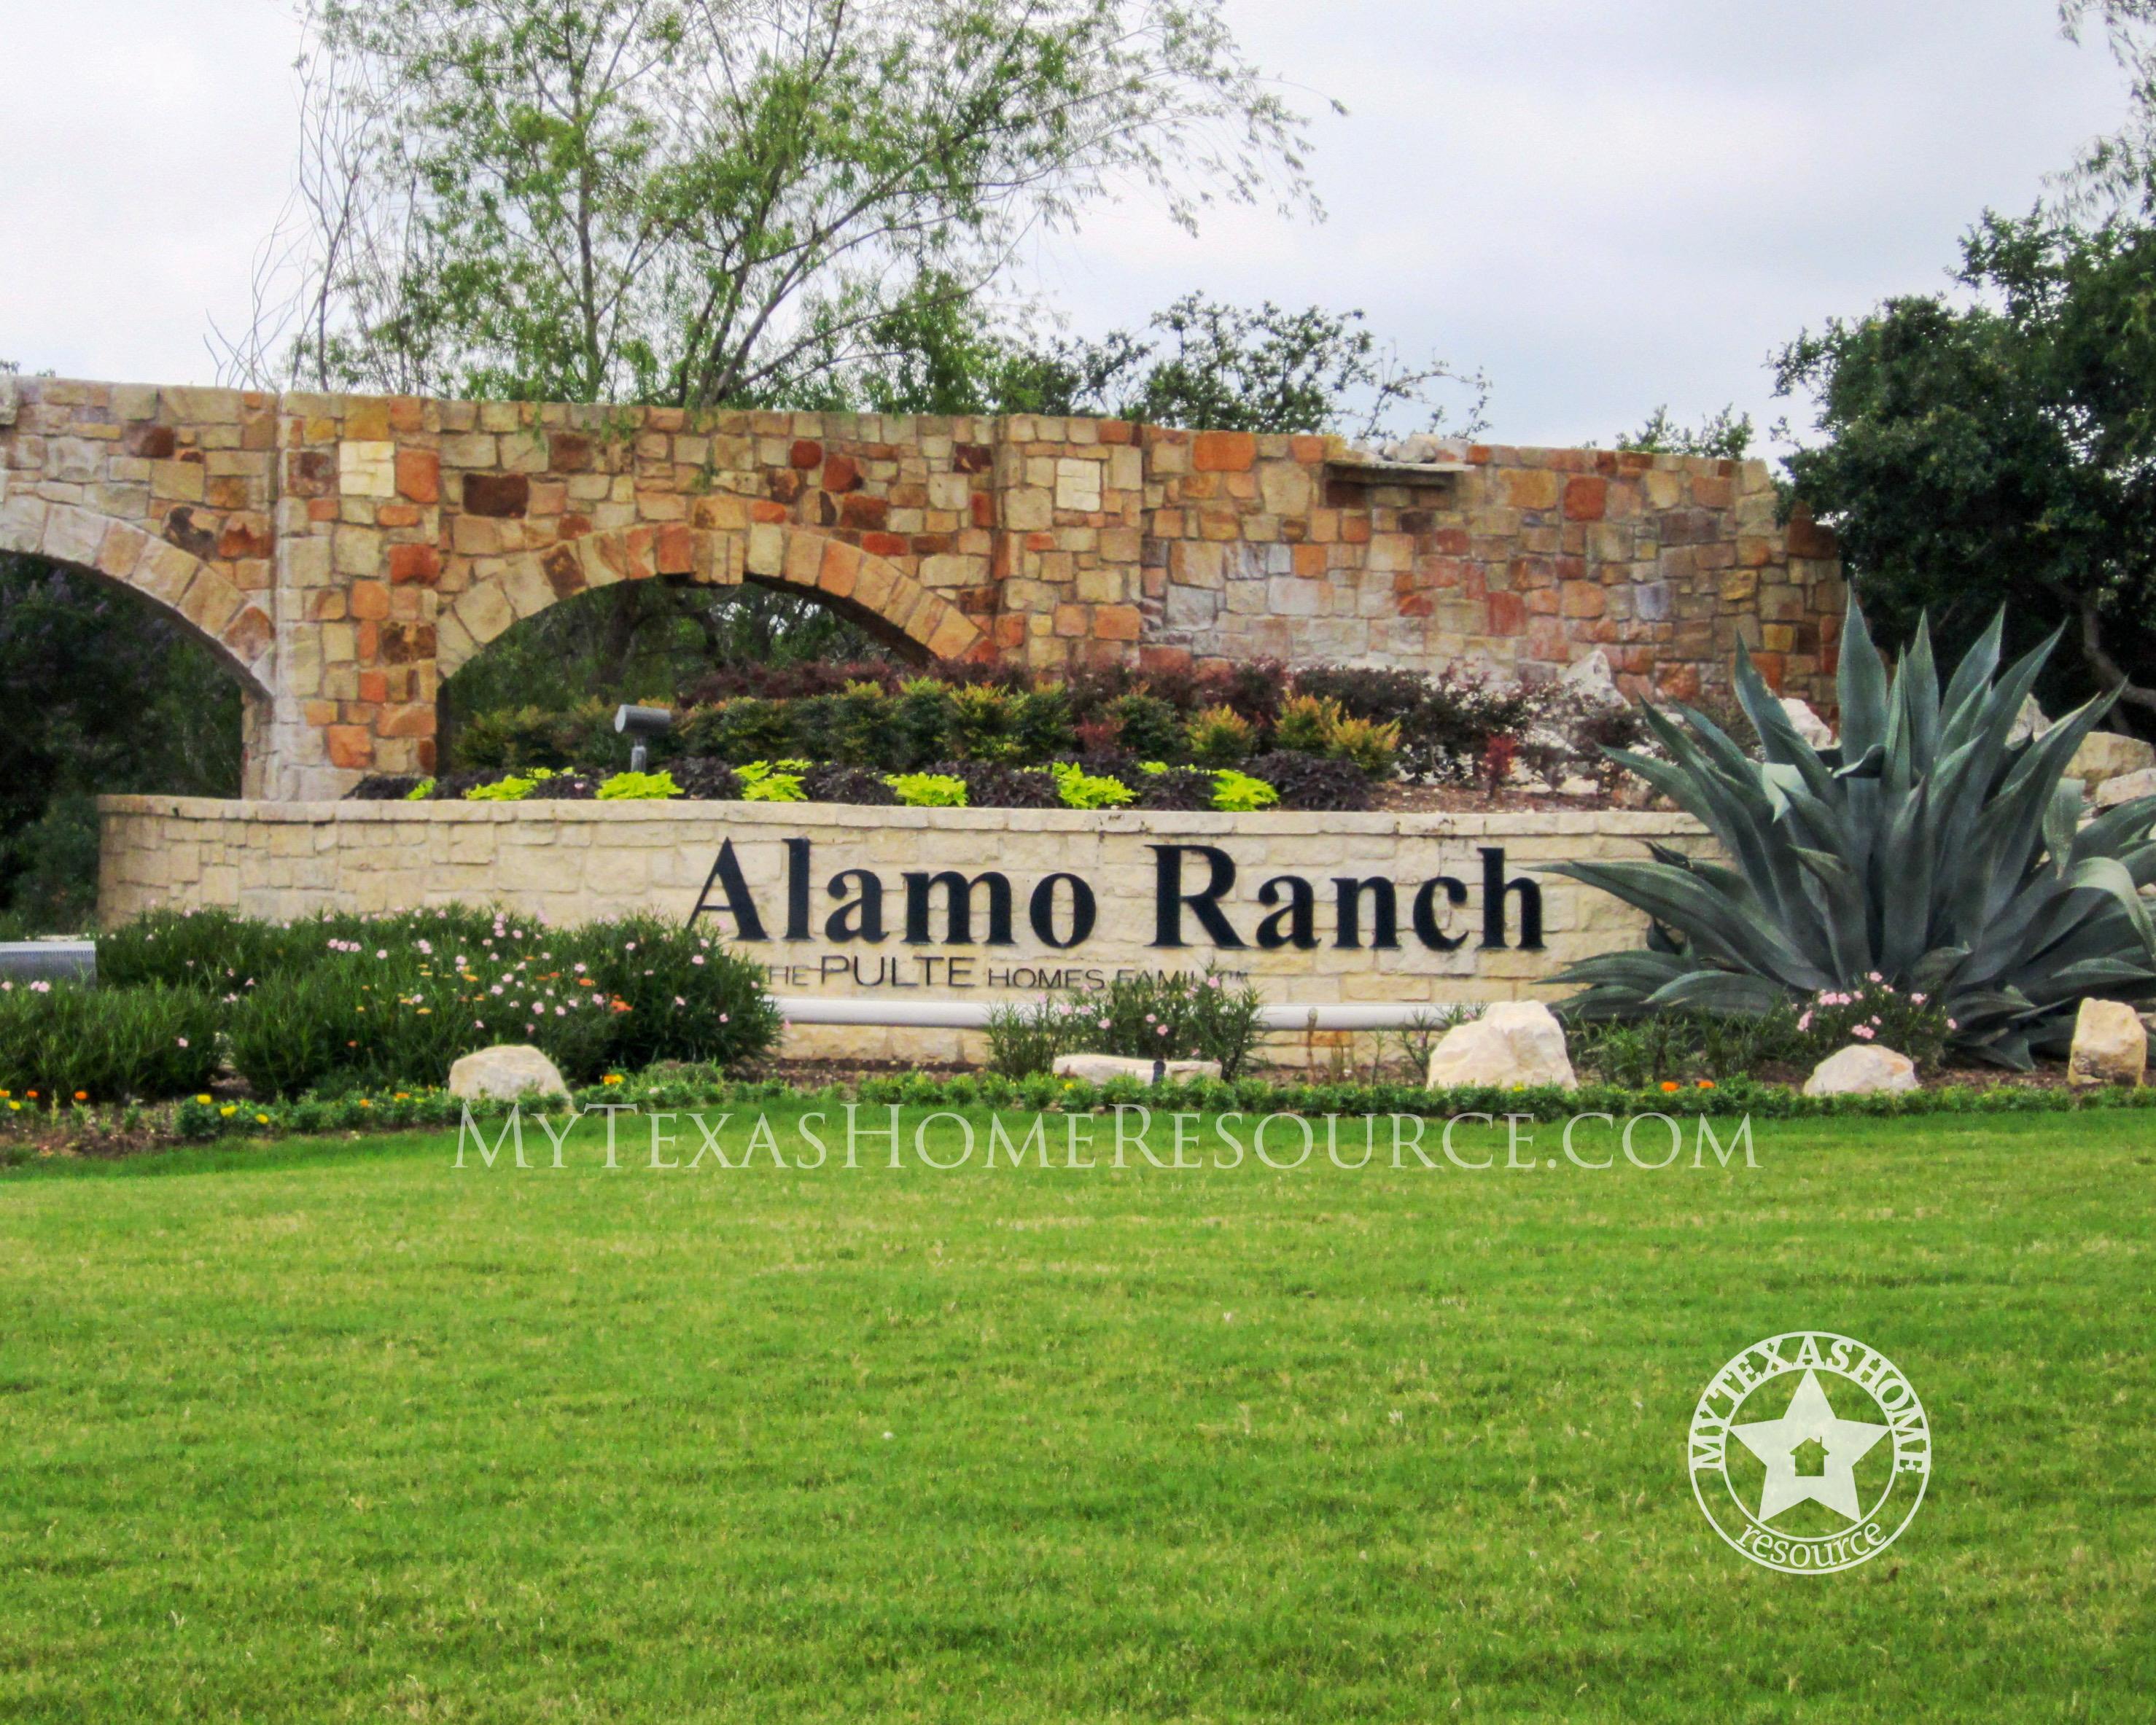 Alamo Ranch Community